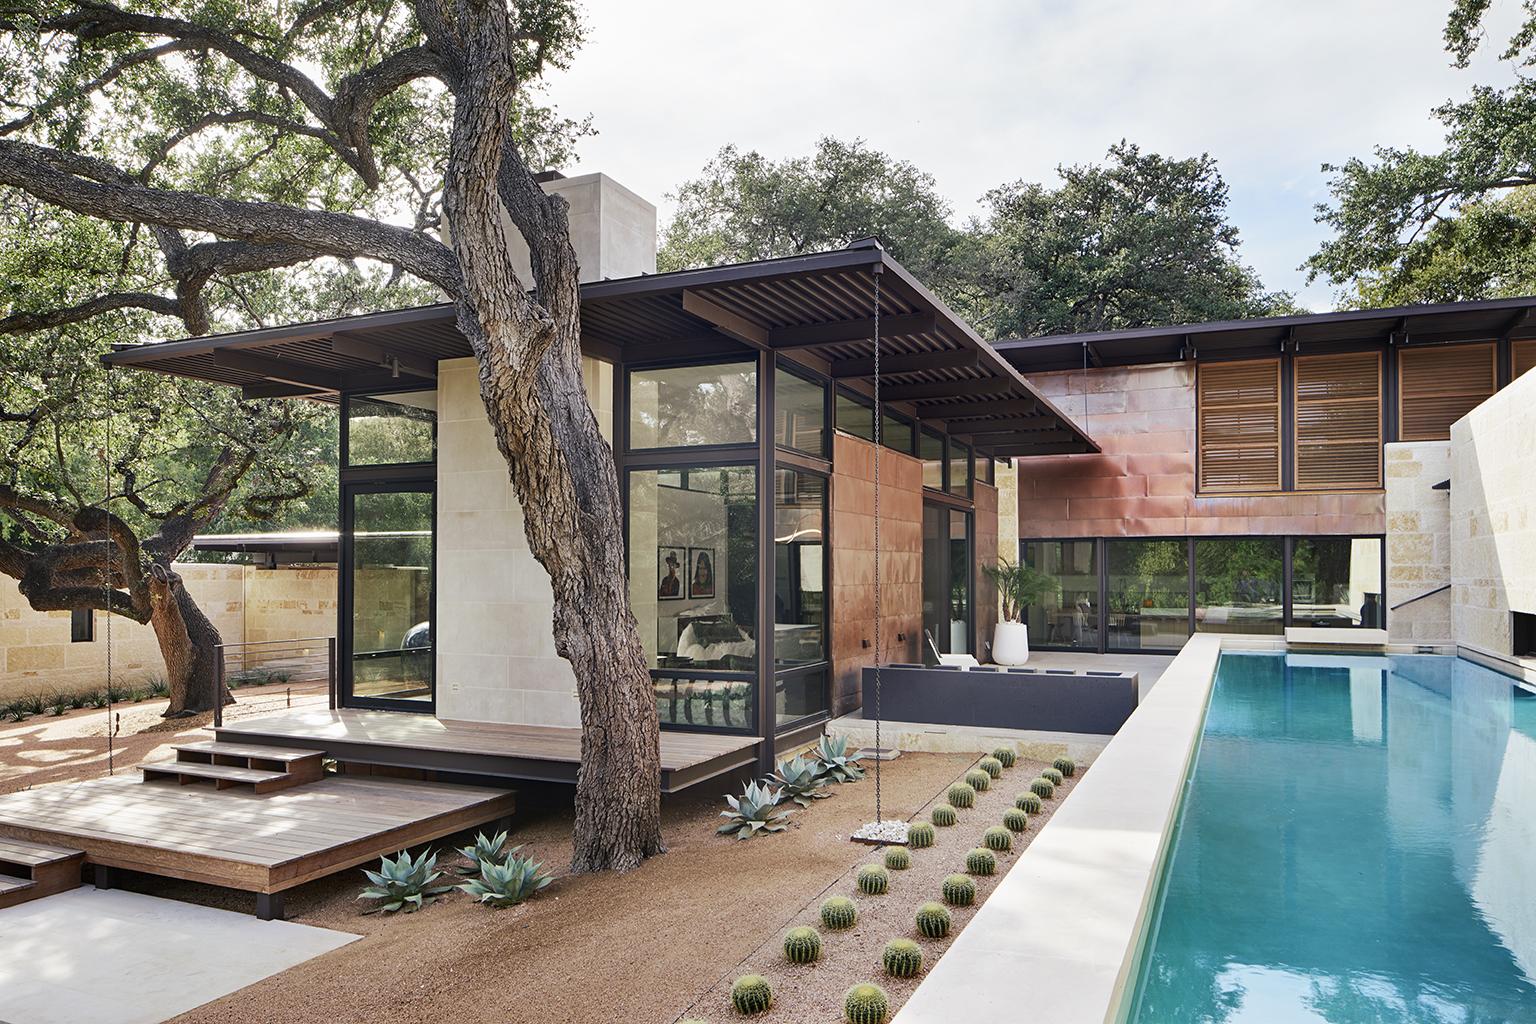 The Best Of San Antonio Architecture In 2016 San Antonio